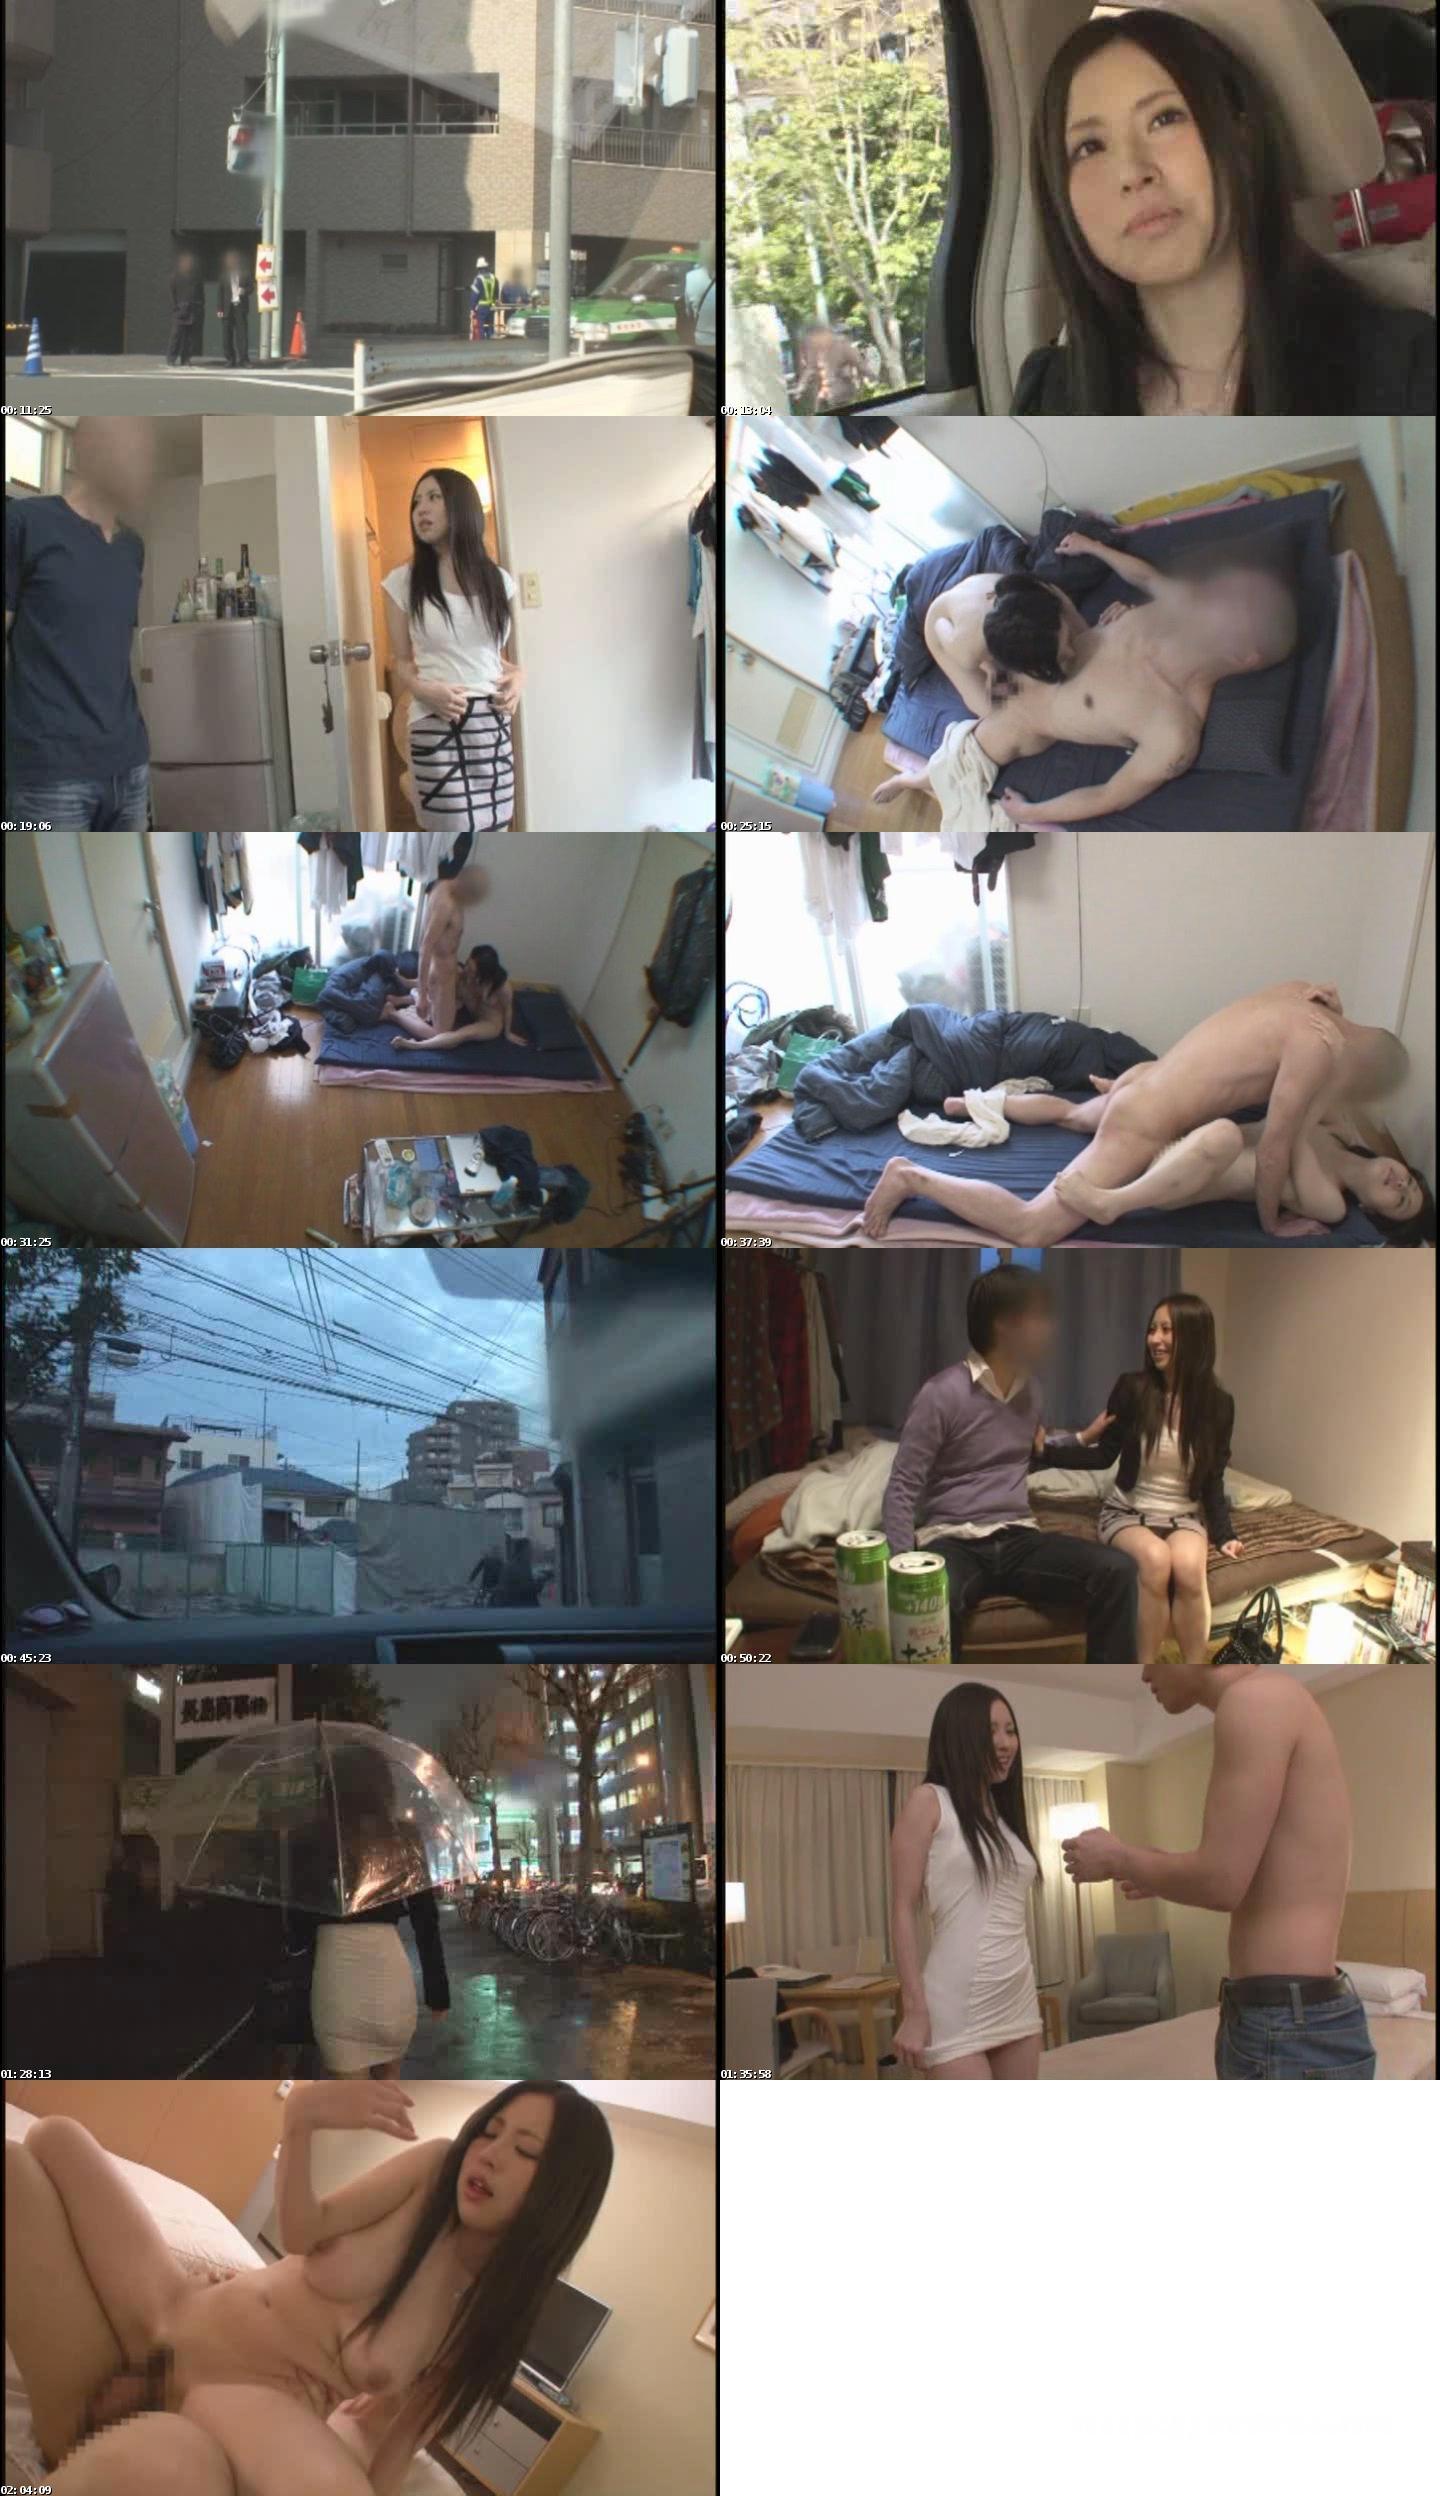 [HD][MAS 039] 絶対的美少女、お貸しします。 ACT.06 MAS